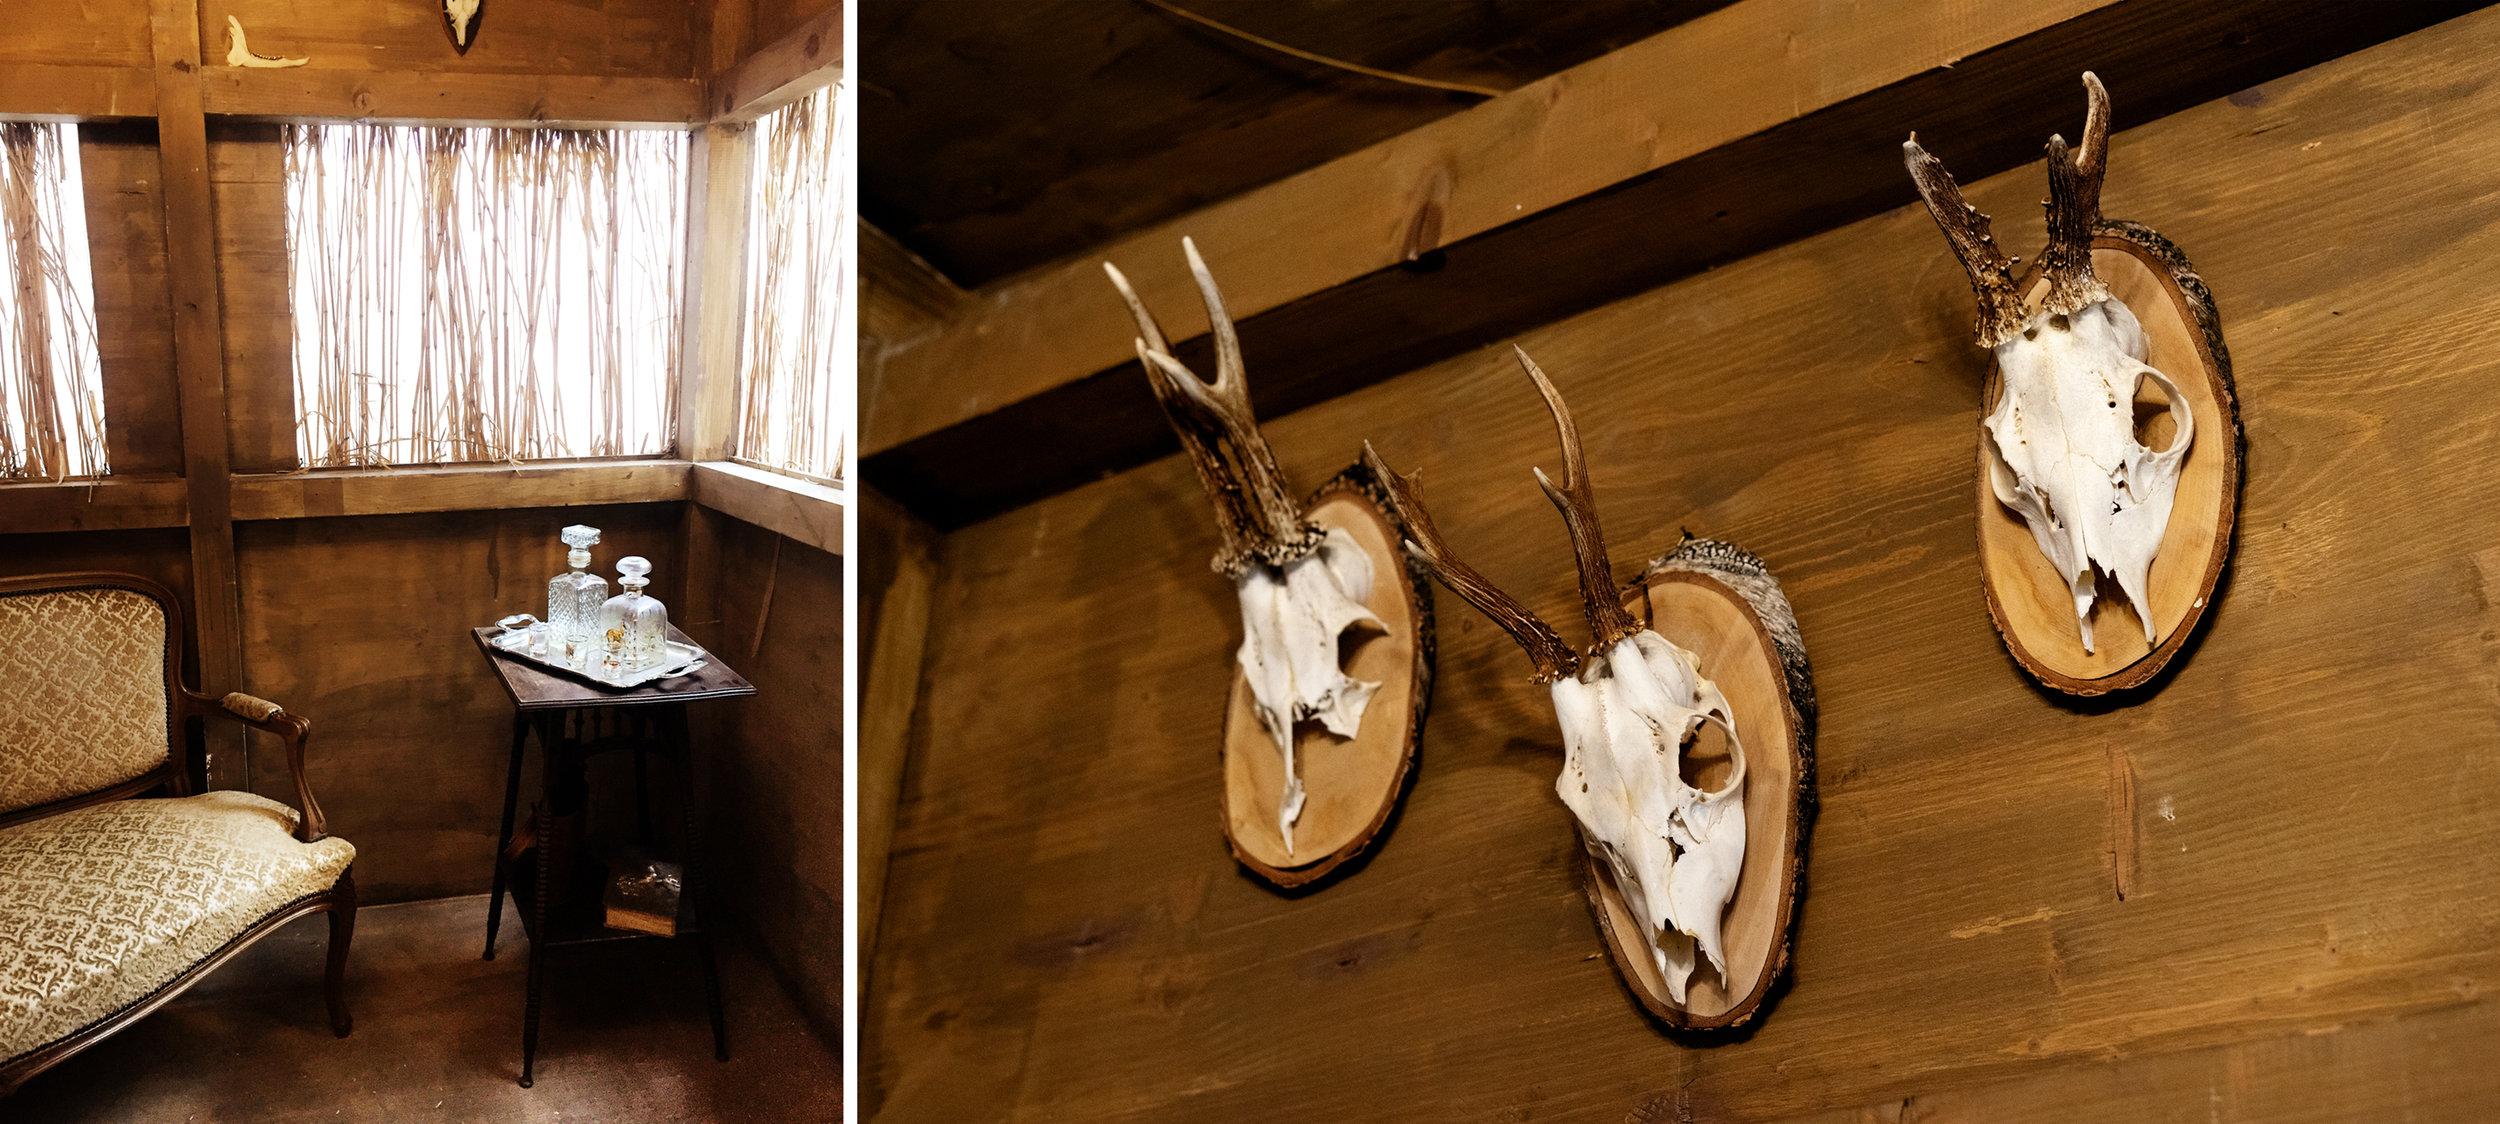 Yksityiskohta  The Hunting blinds and Hunting Standards  (2005-2008) teoksen metsästysmajasta  The Dandy-Rococo.